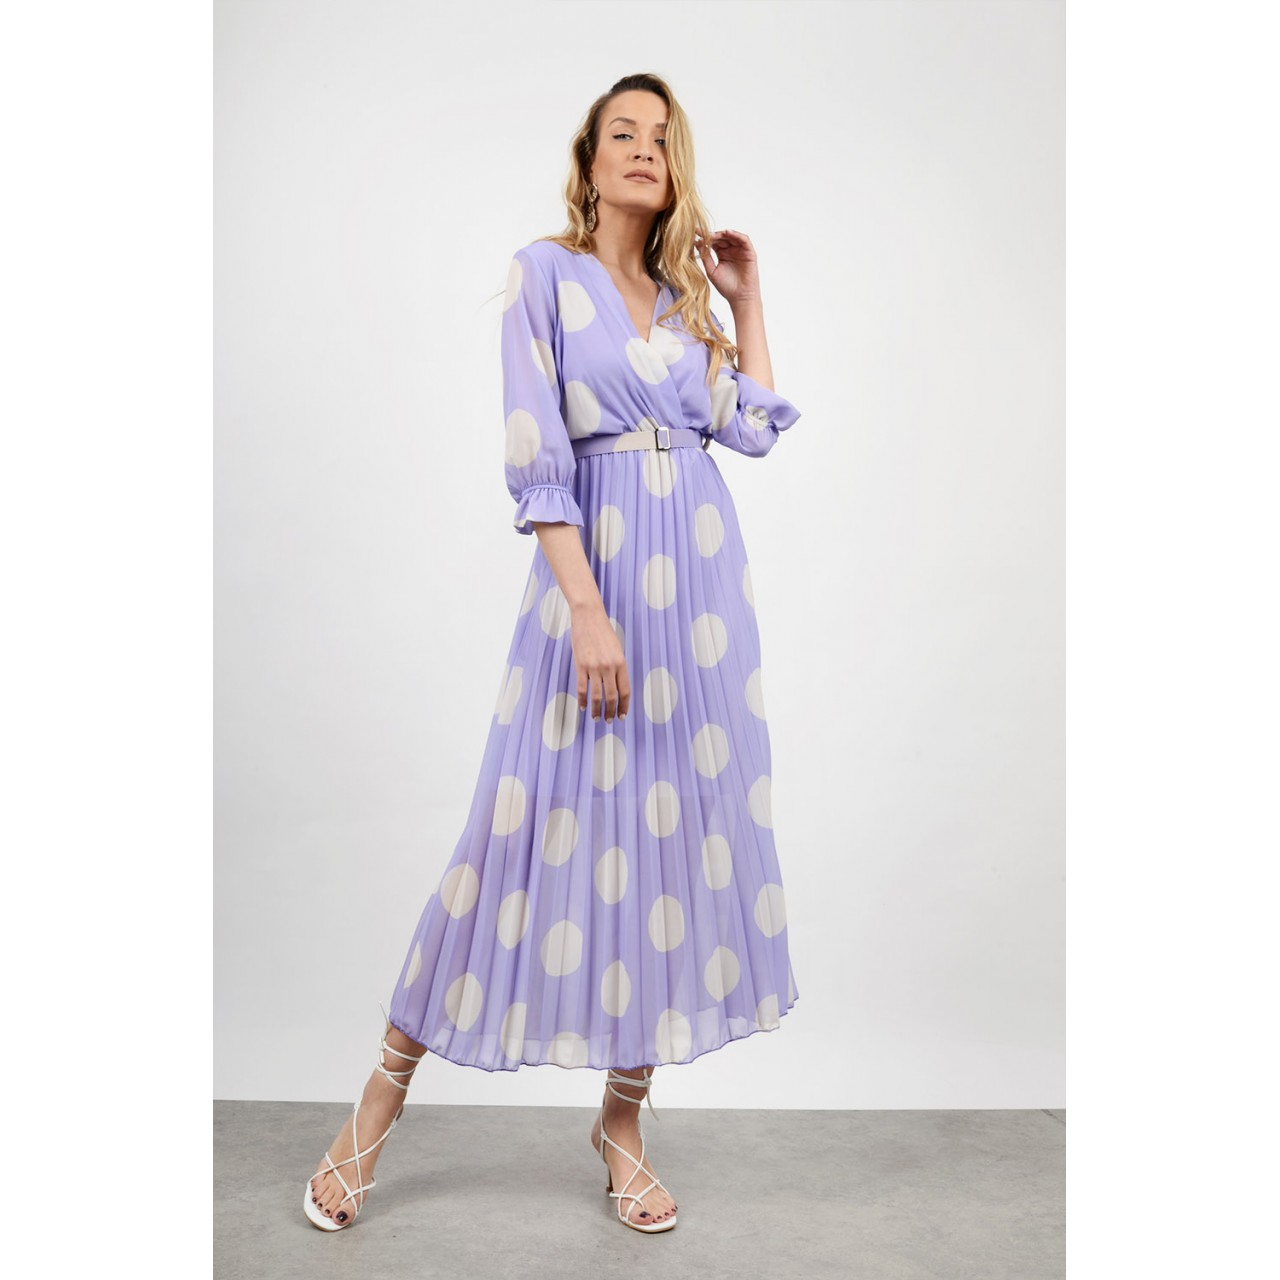 Midi polka dotted dress with belt